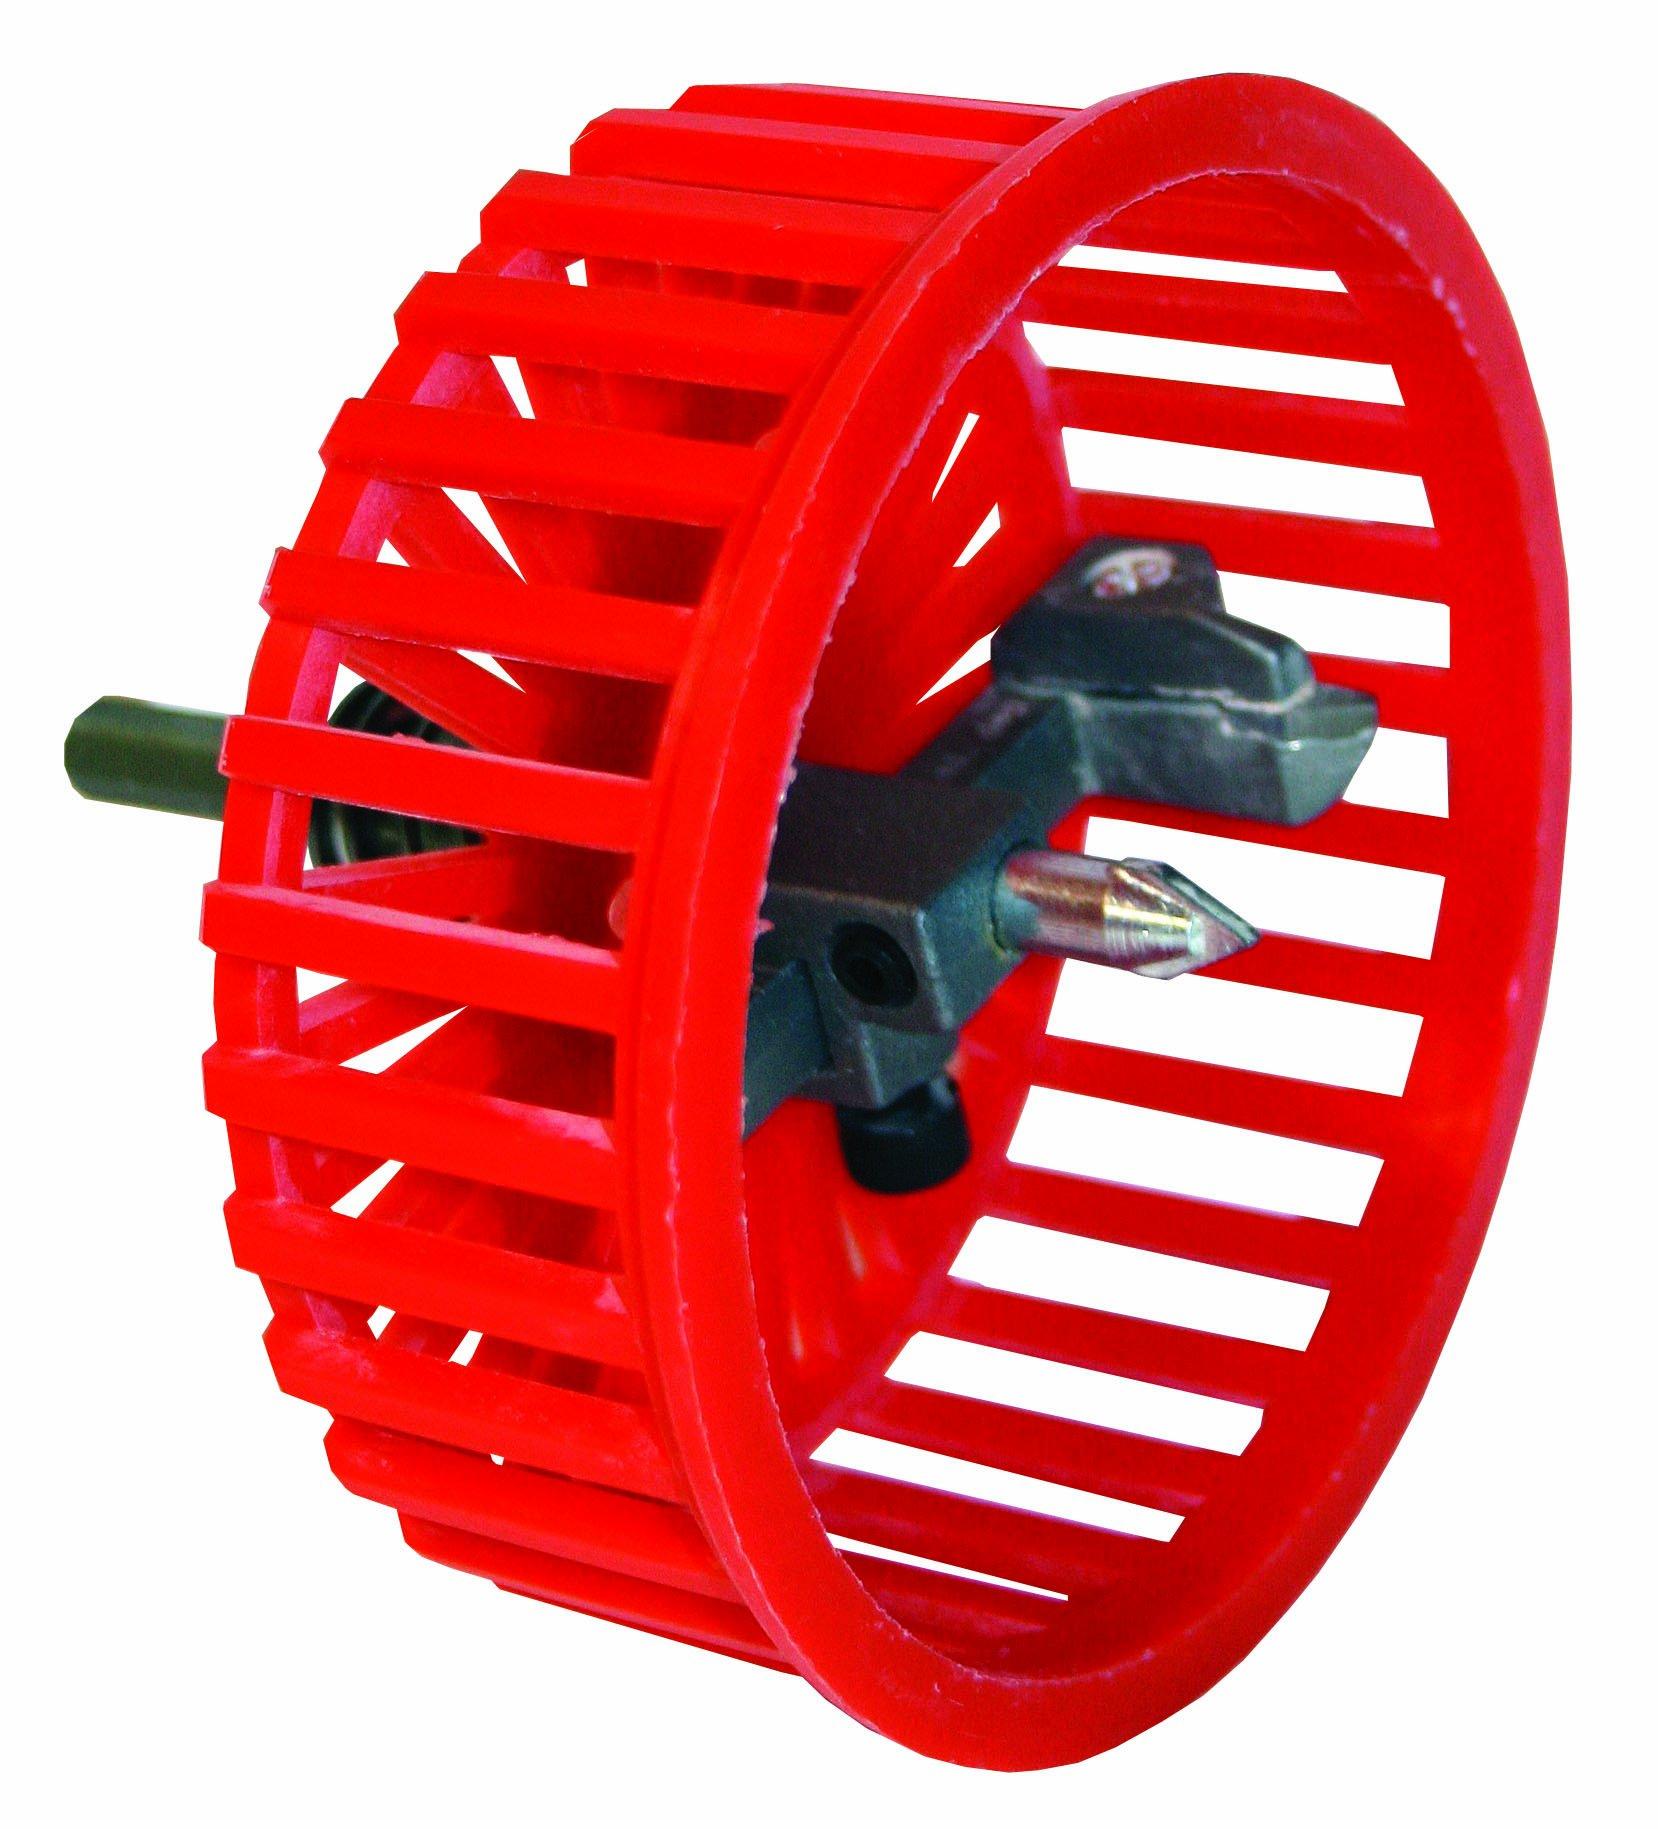 Task Tools T37255 Circular Tile Cutter